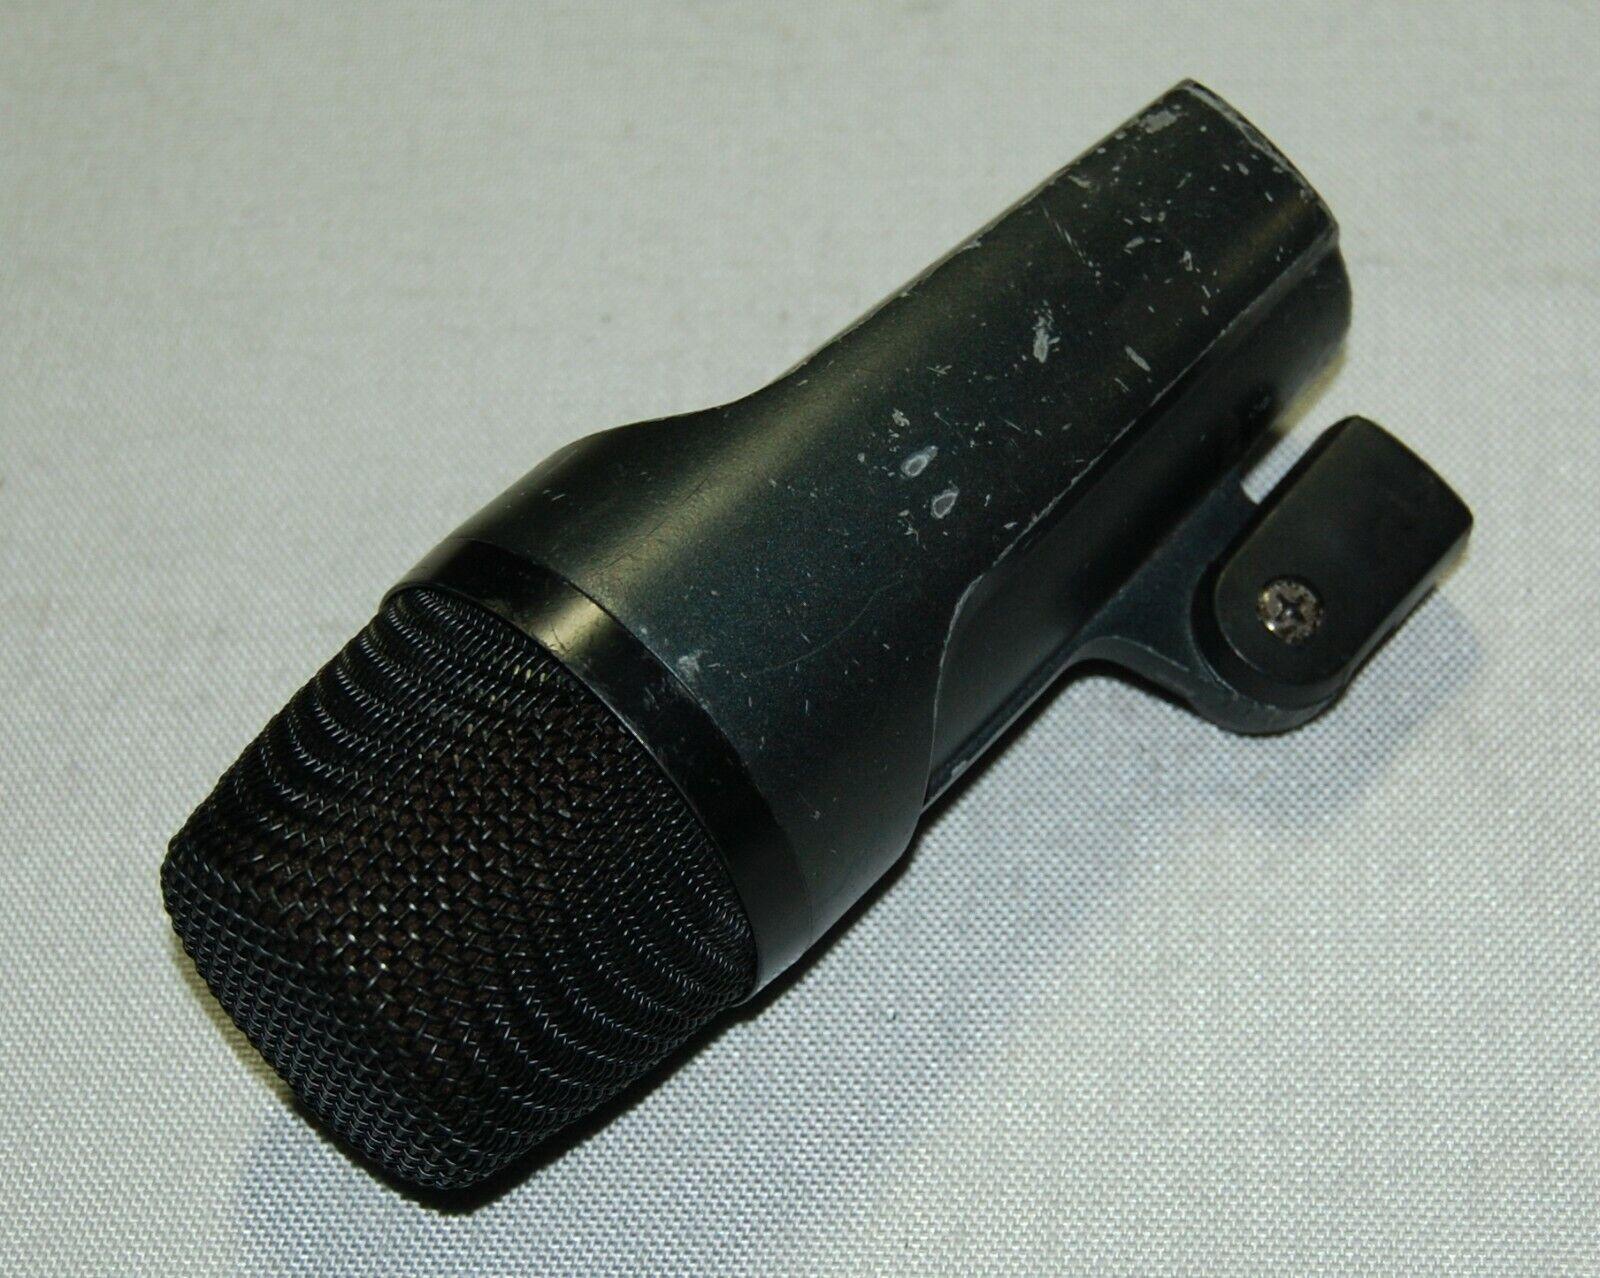 Sennheiser E-602 Dynamic Cardioid Mikrofon, Lot of Two (2)